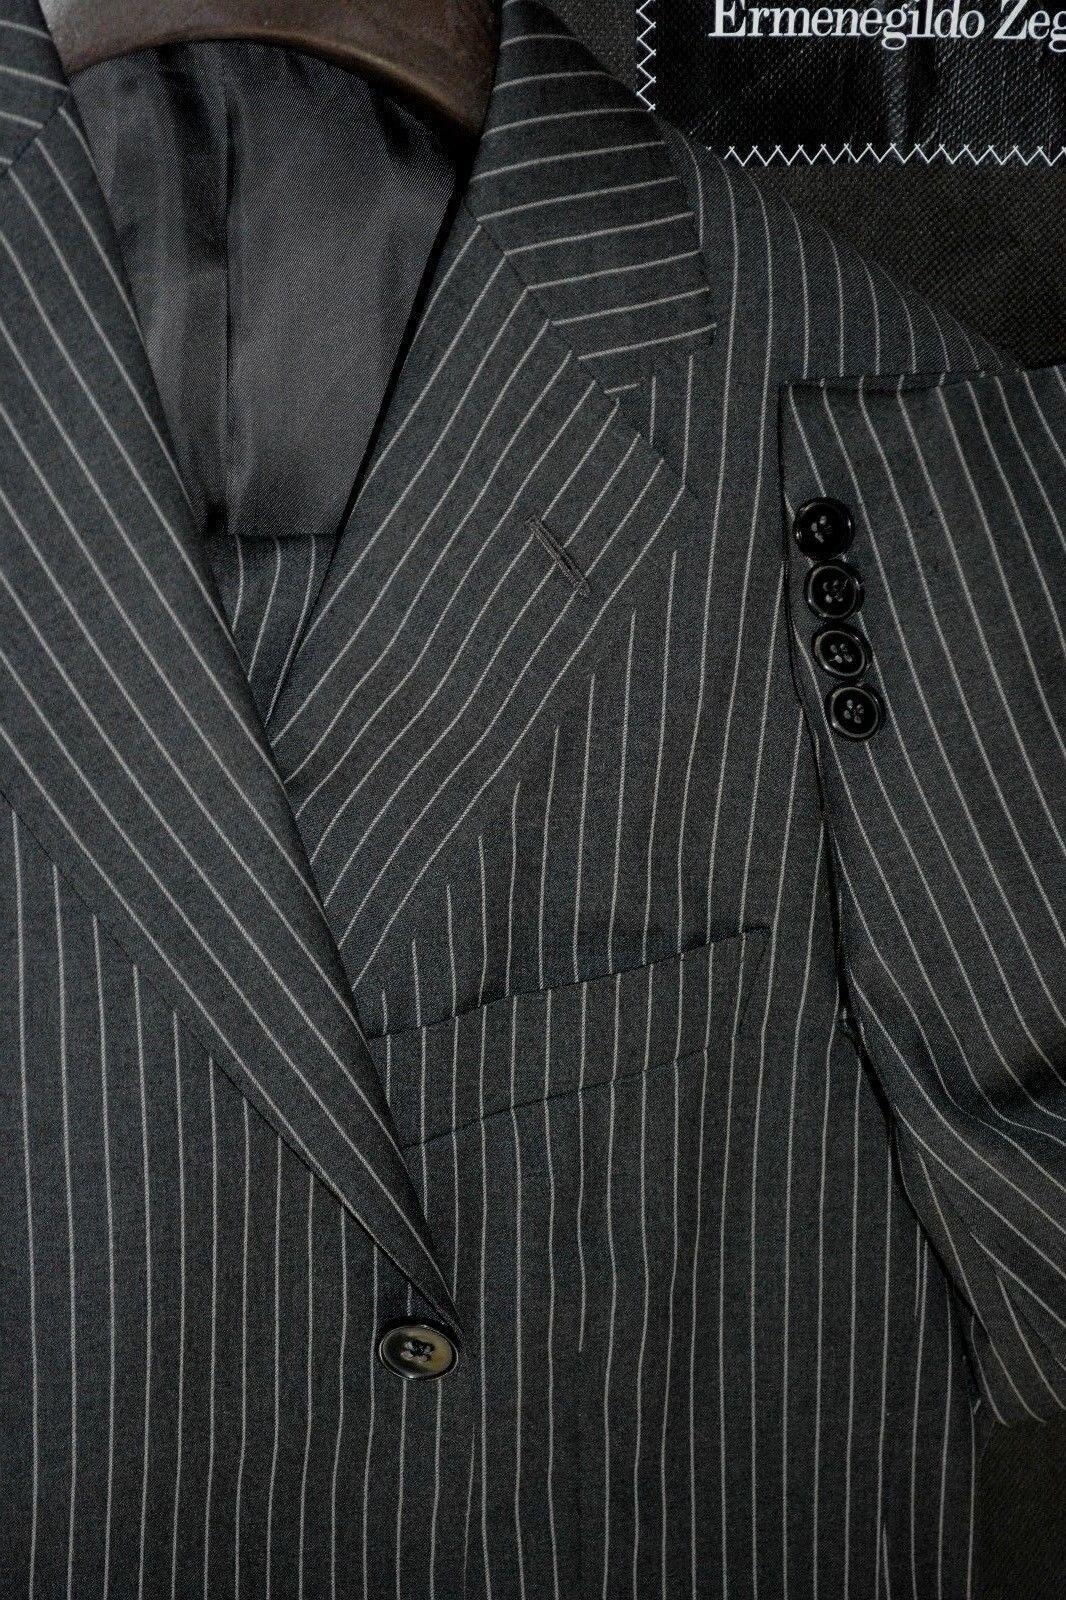 3495 Ermenegildo Zegna grau Bold Stripe Wool Suit 42S 36W